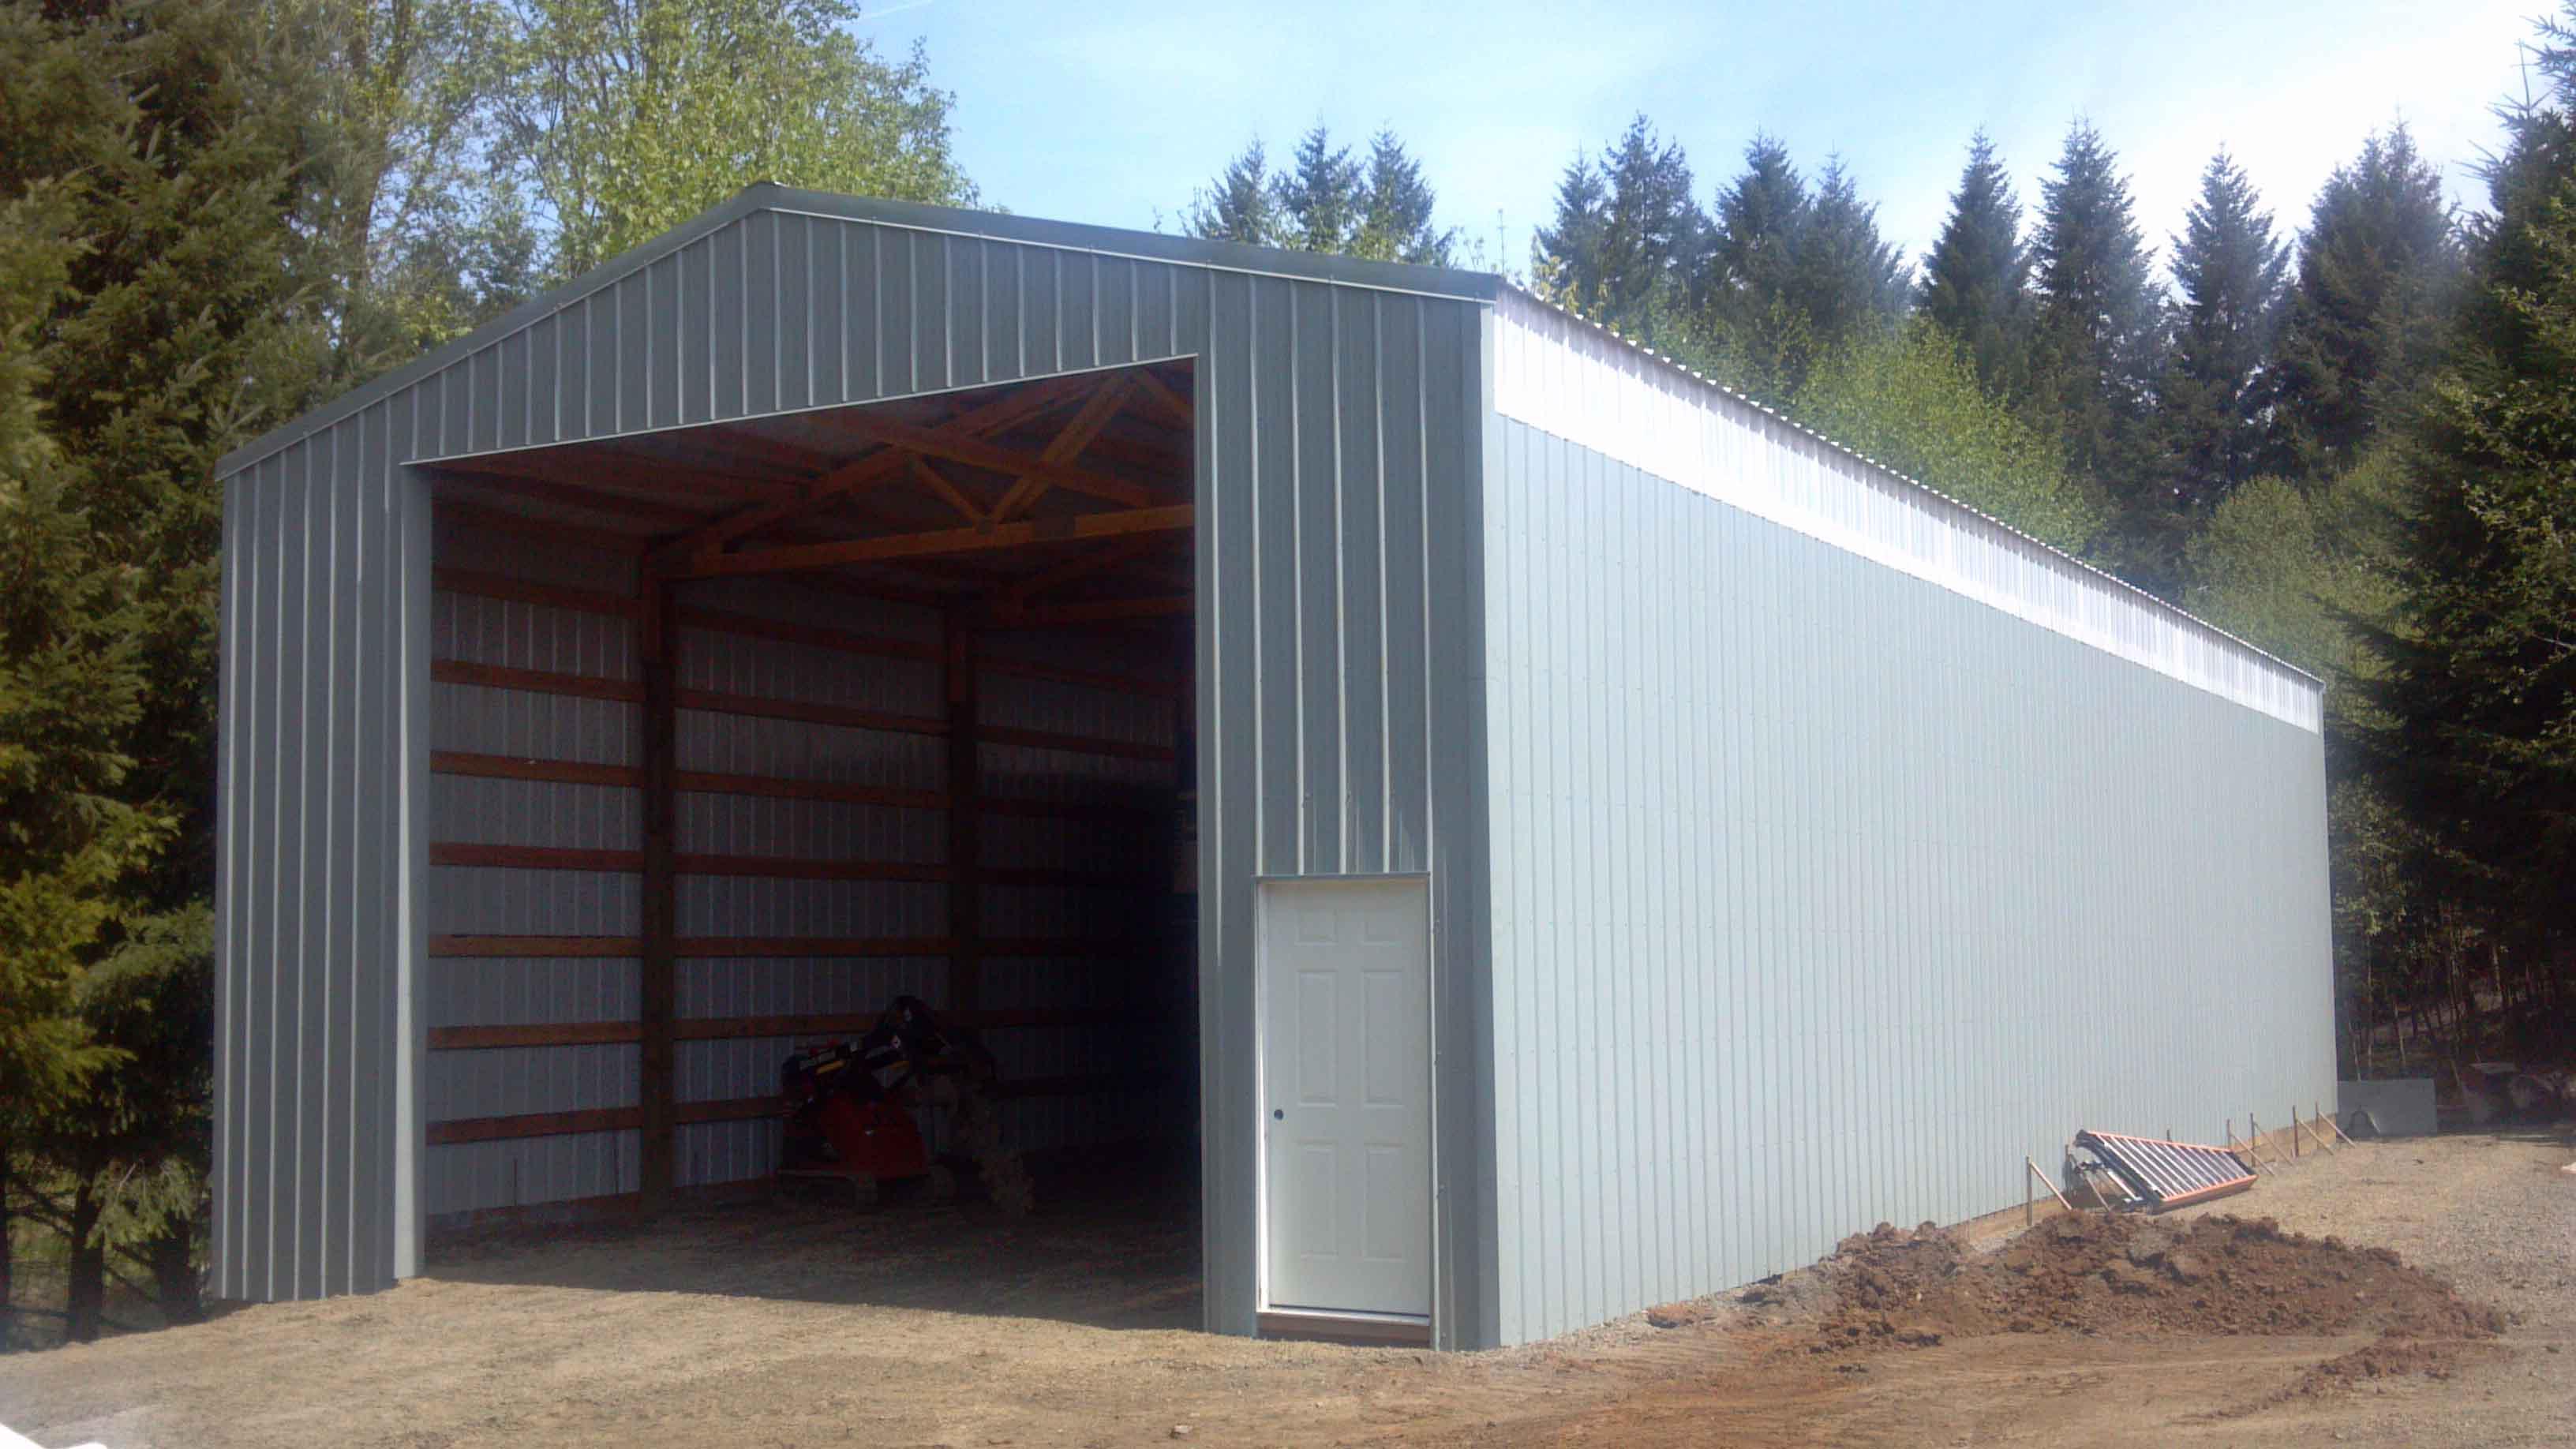 24x60x16 farm equiptment structure